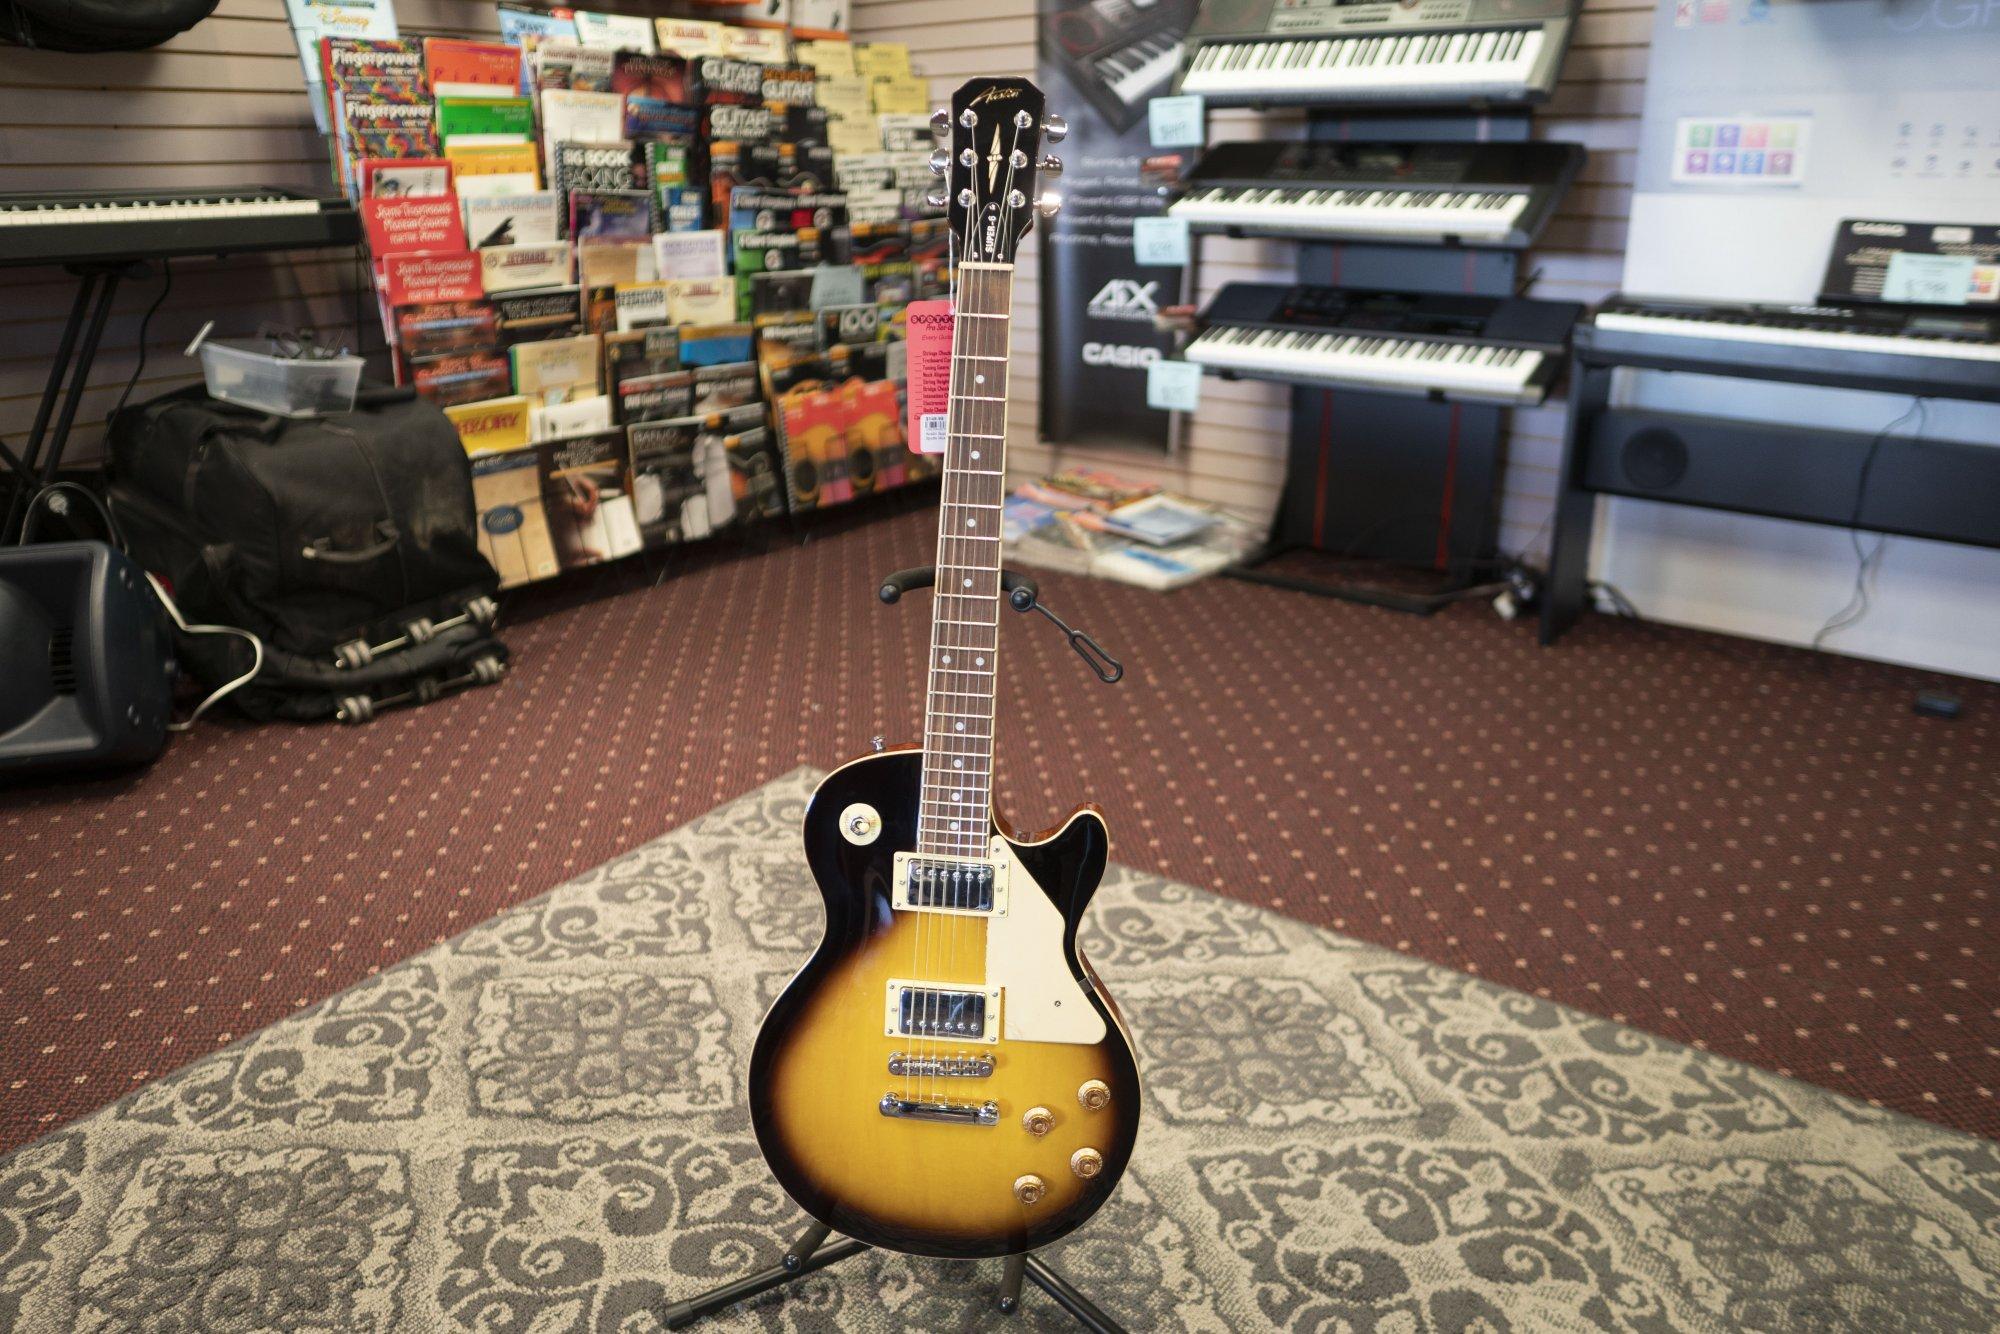 Austin Super 6 Electric Guitar (Used)